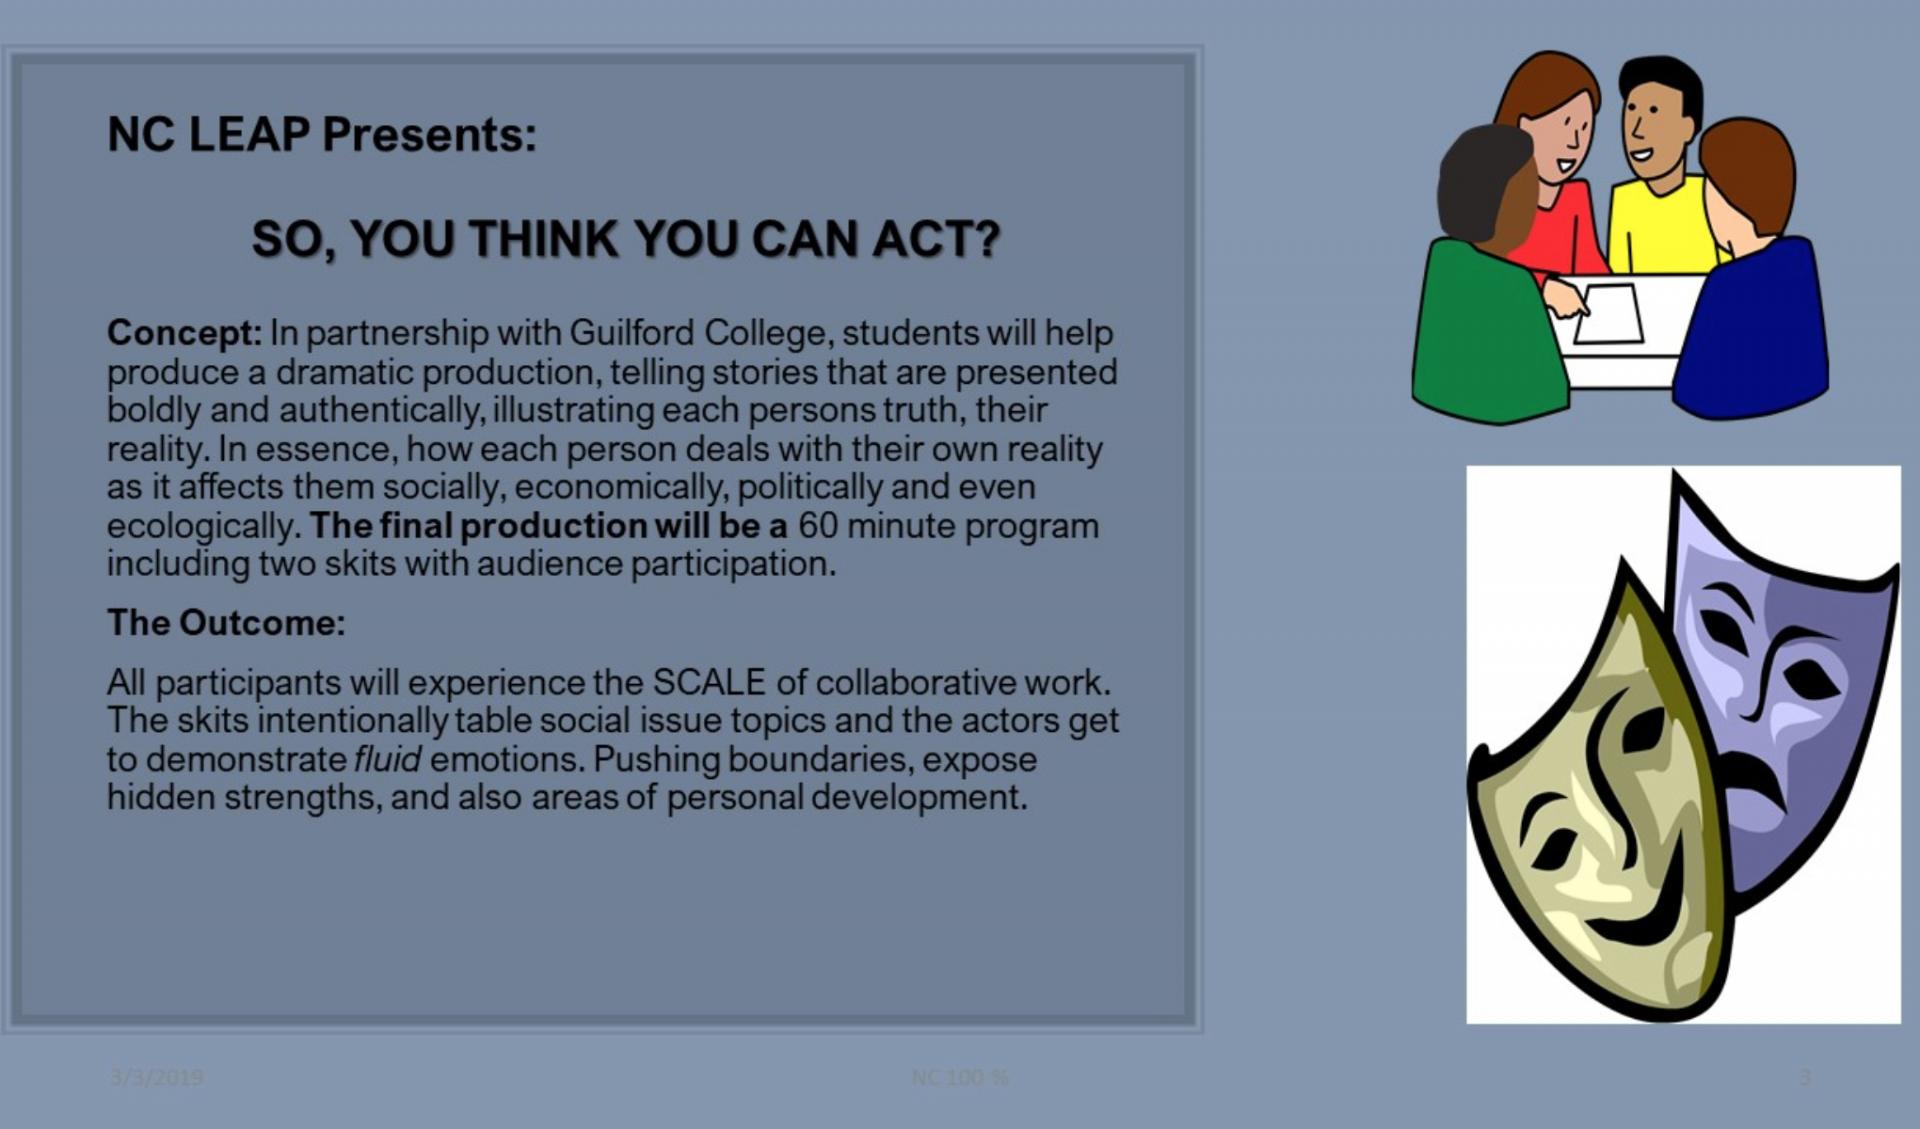 NC leap 100 slide